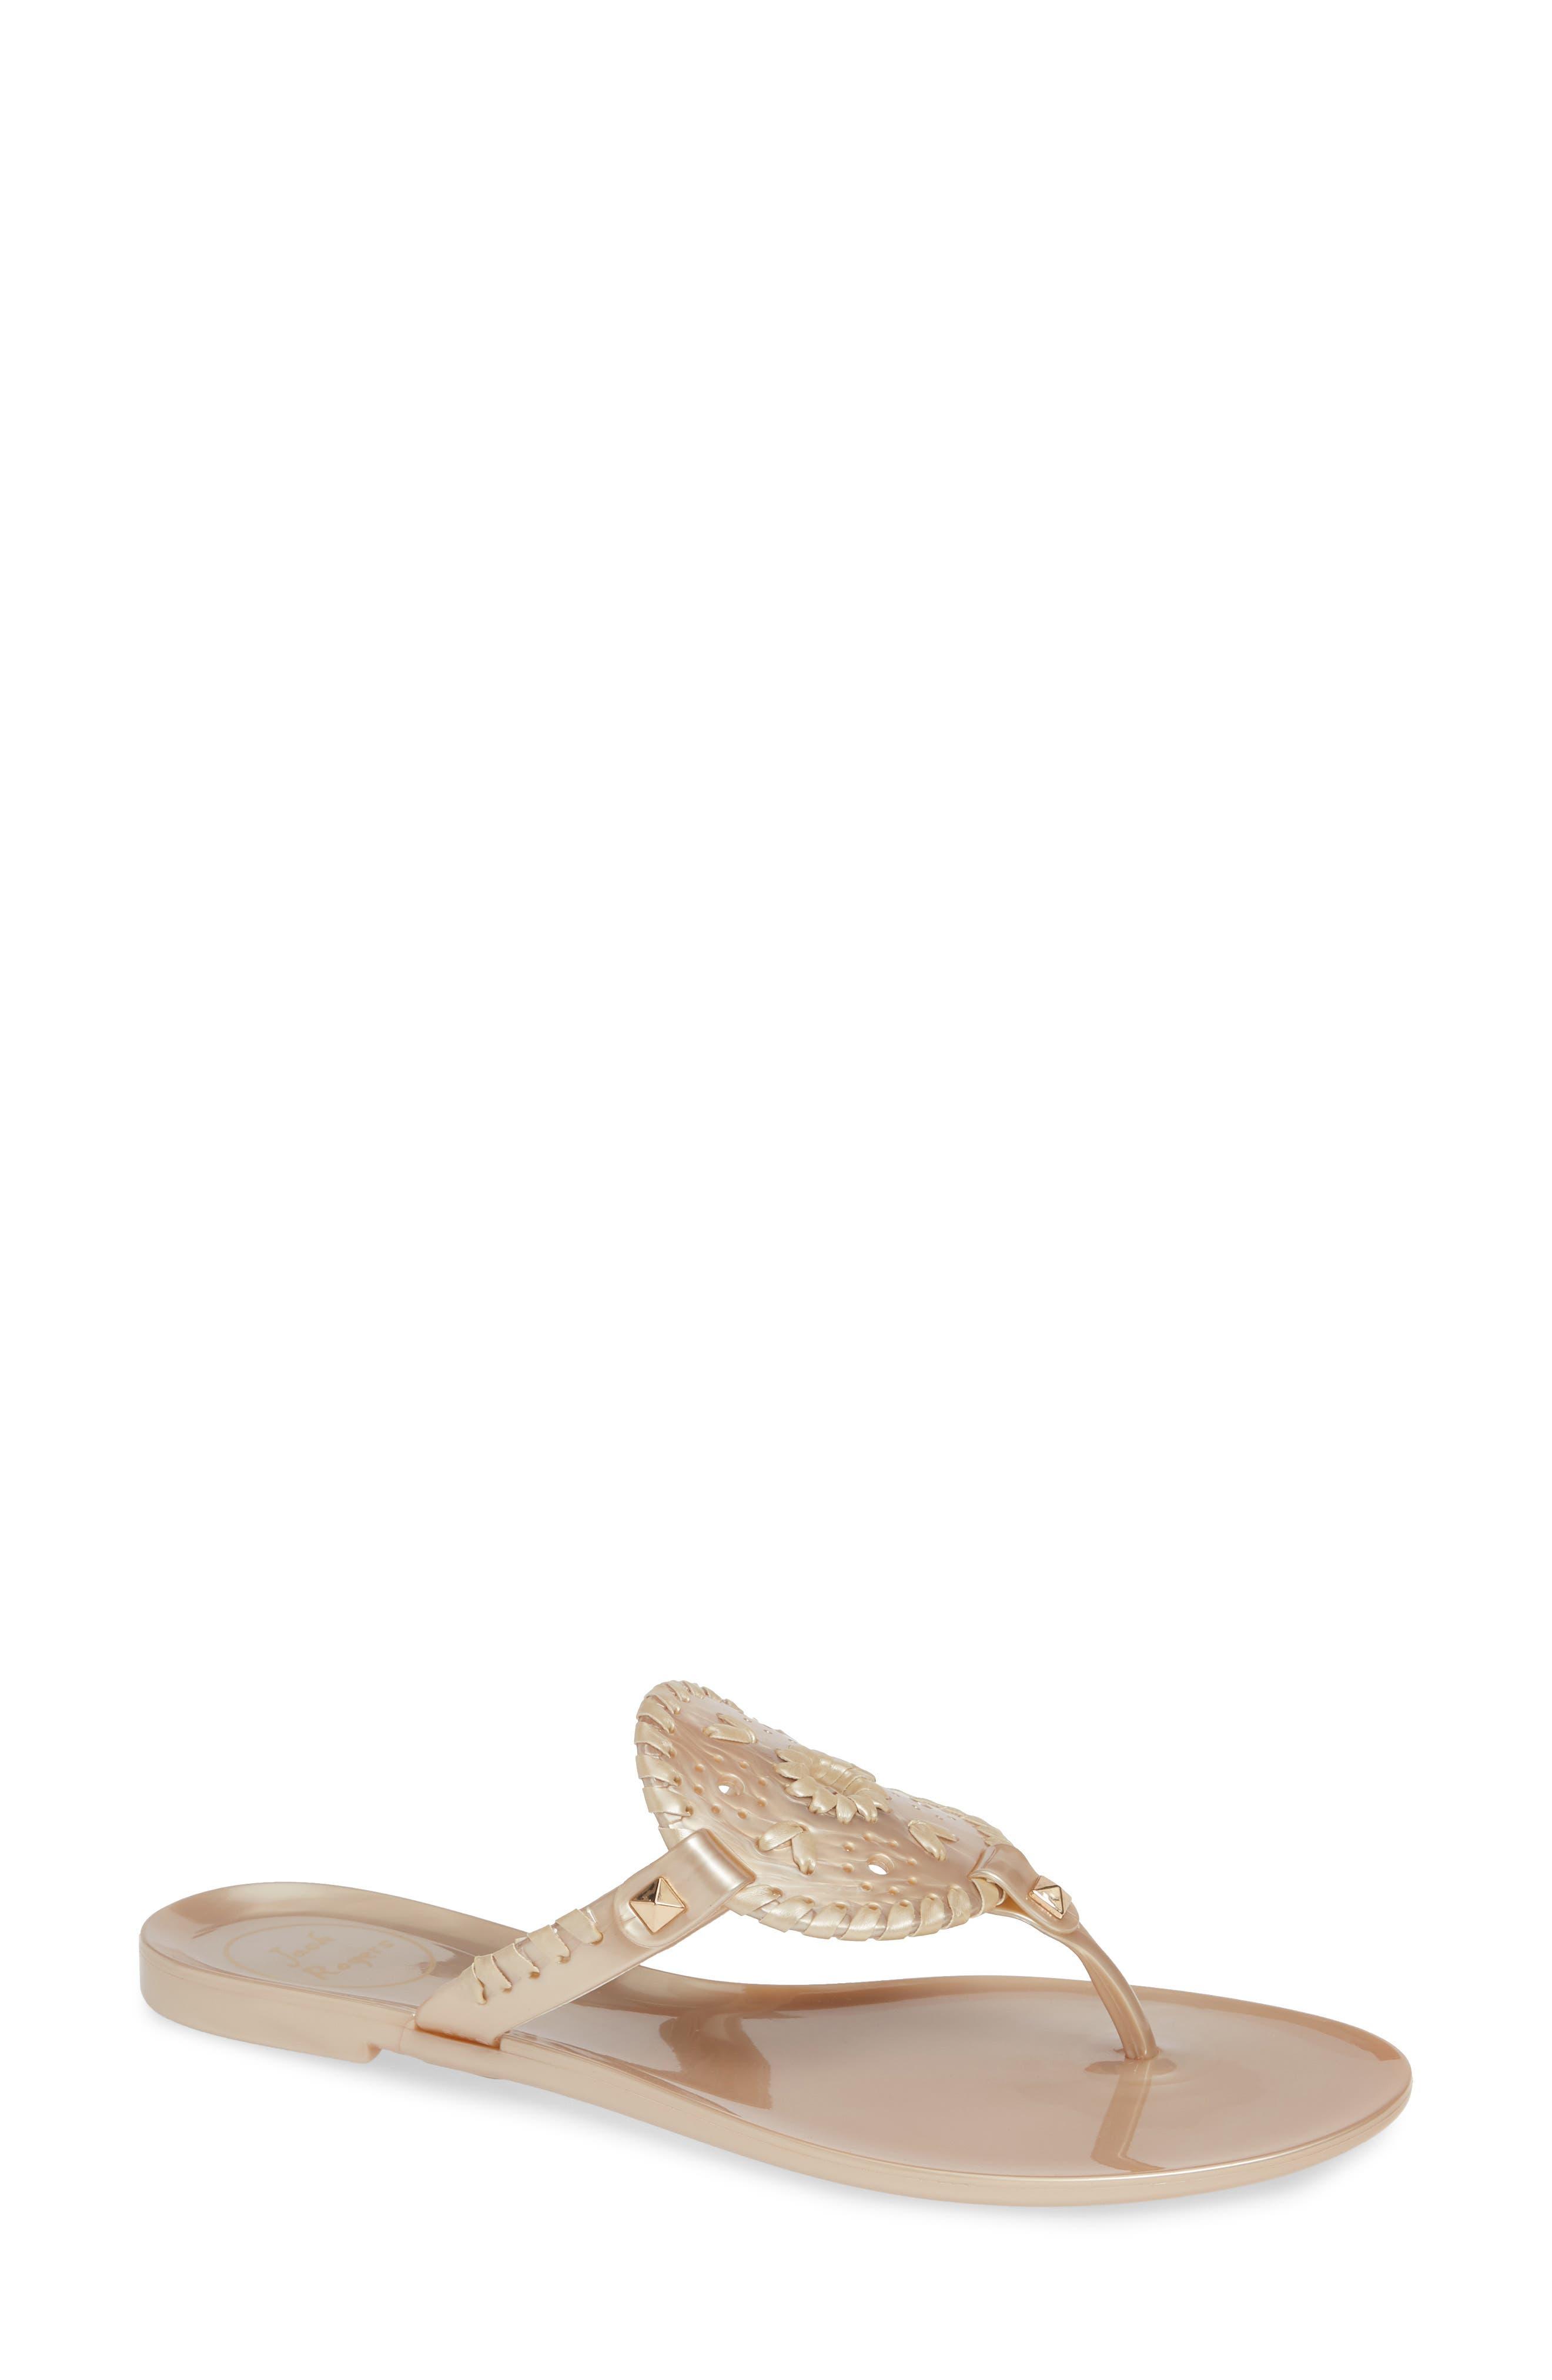 5081e446bf8433 Women s Jack Rogers Shoes